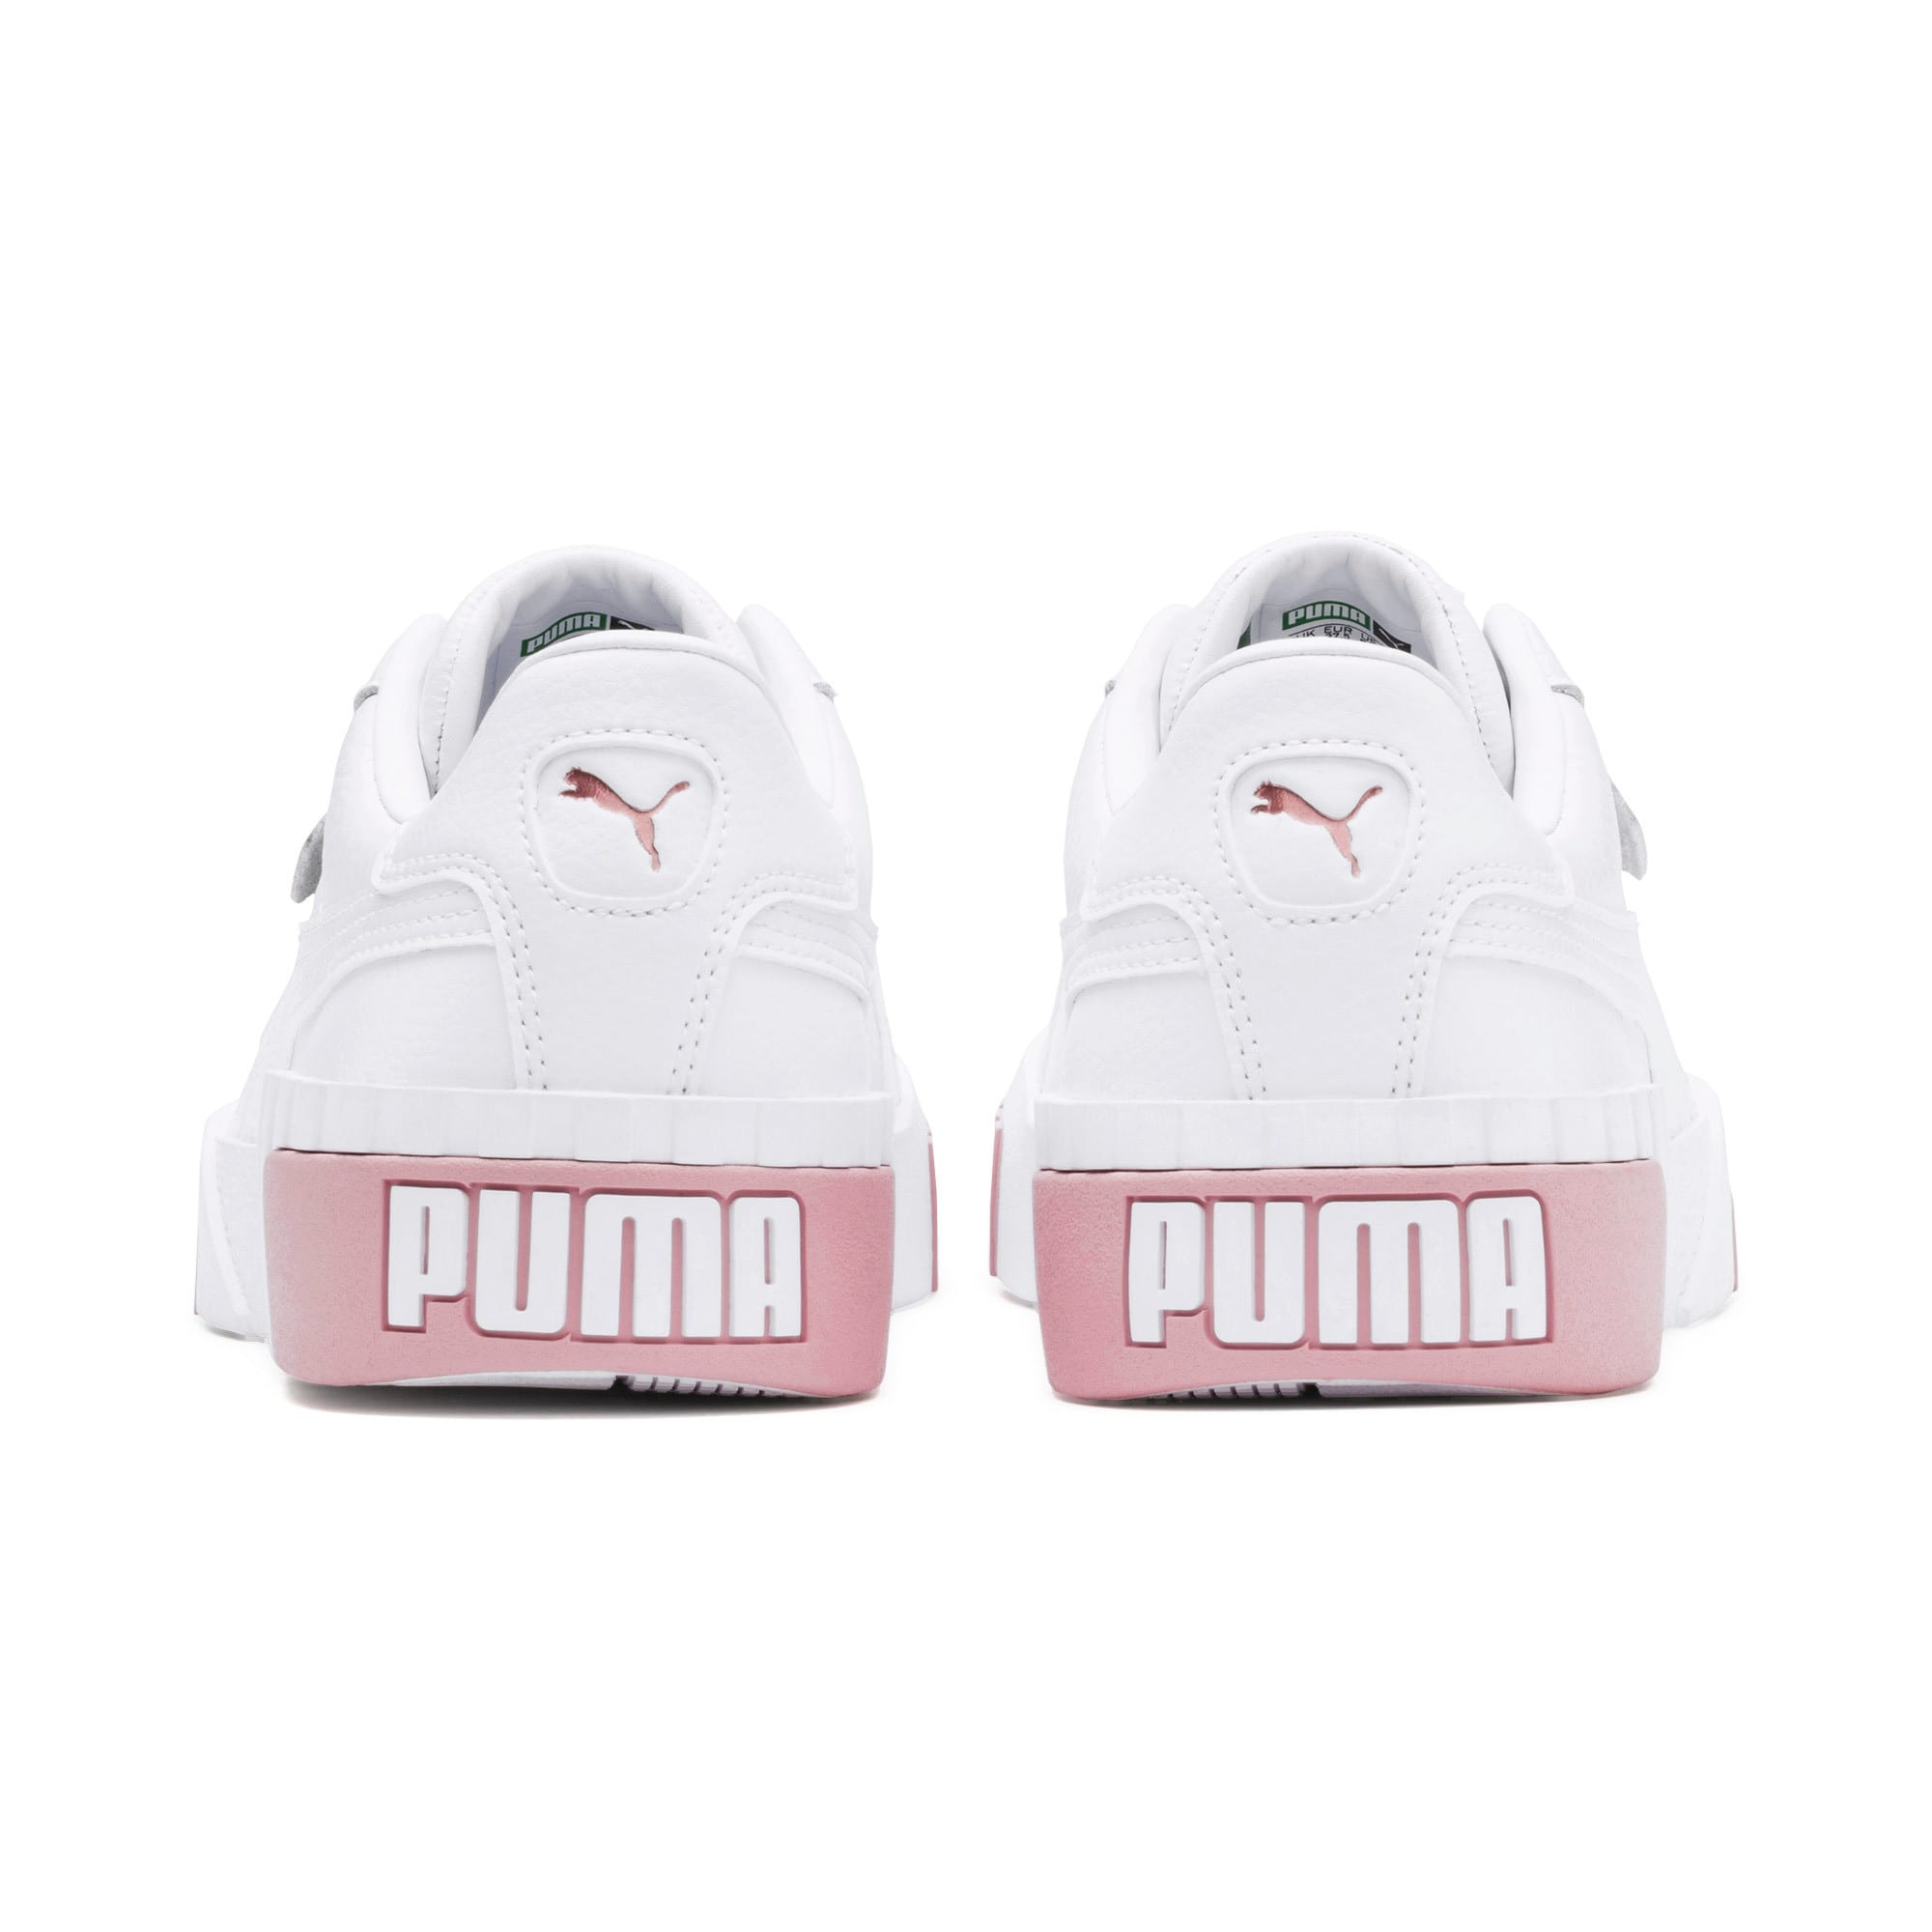 Thumbnail 4 of Cali Women's Sneakers, Puma White-Rose Gold, medium